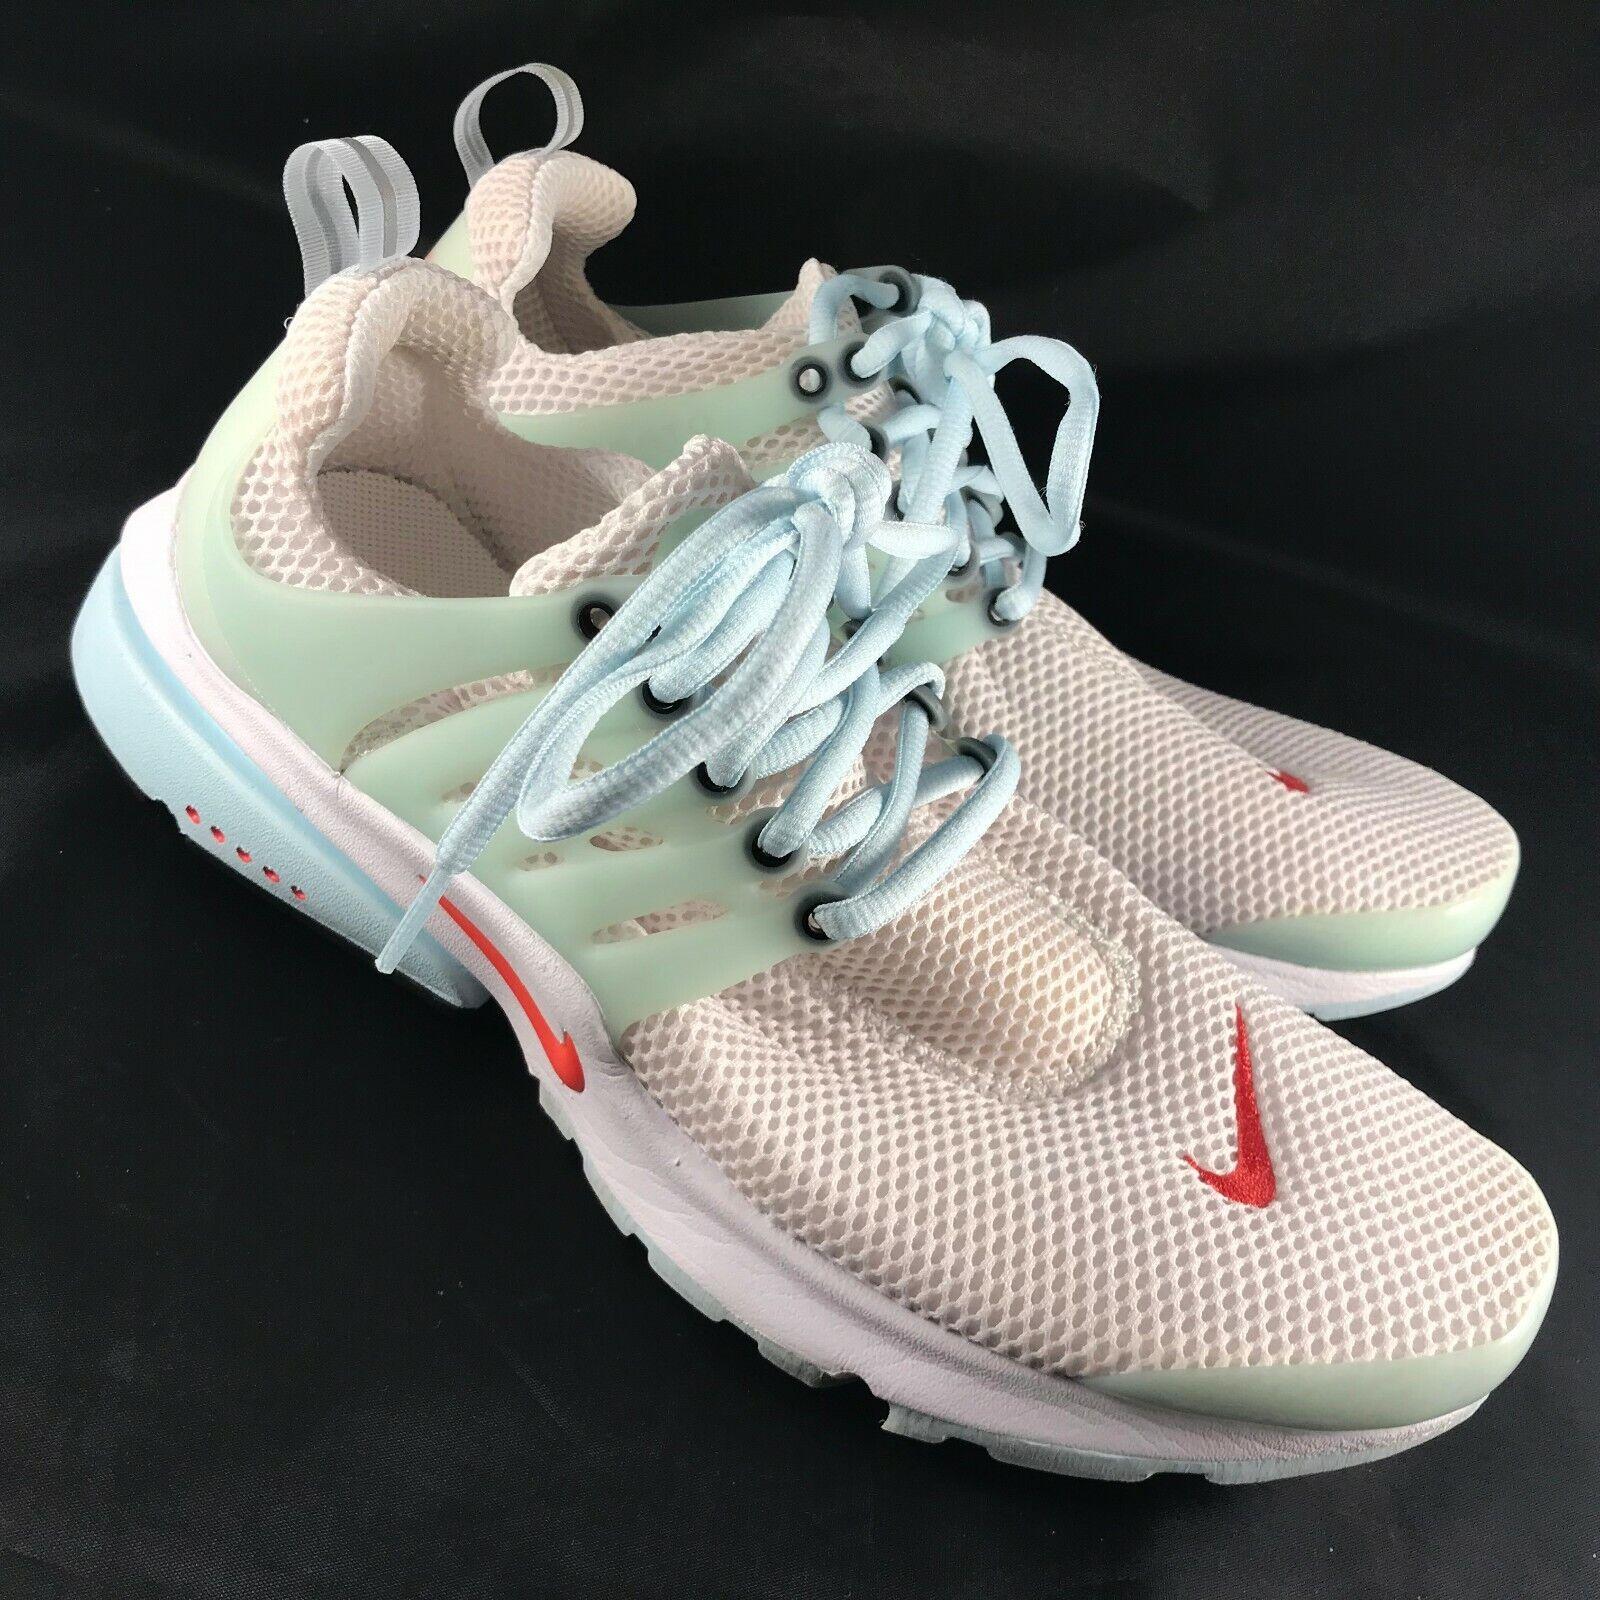 Nike Air Presto QS Unholy Cumulus VNDS Size M 10-11 789870-181